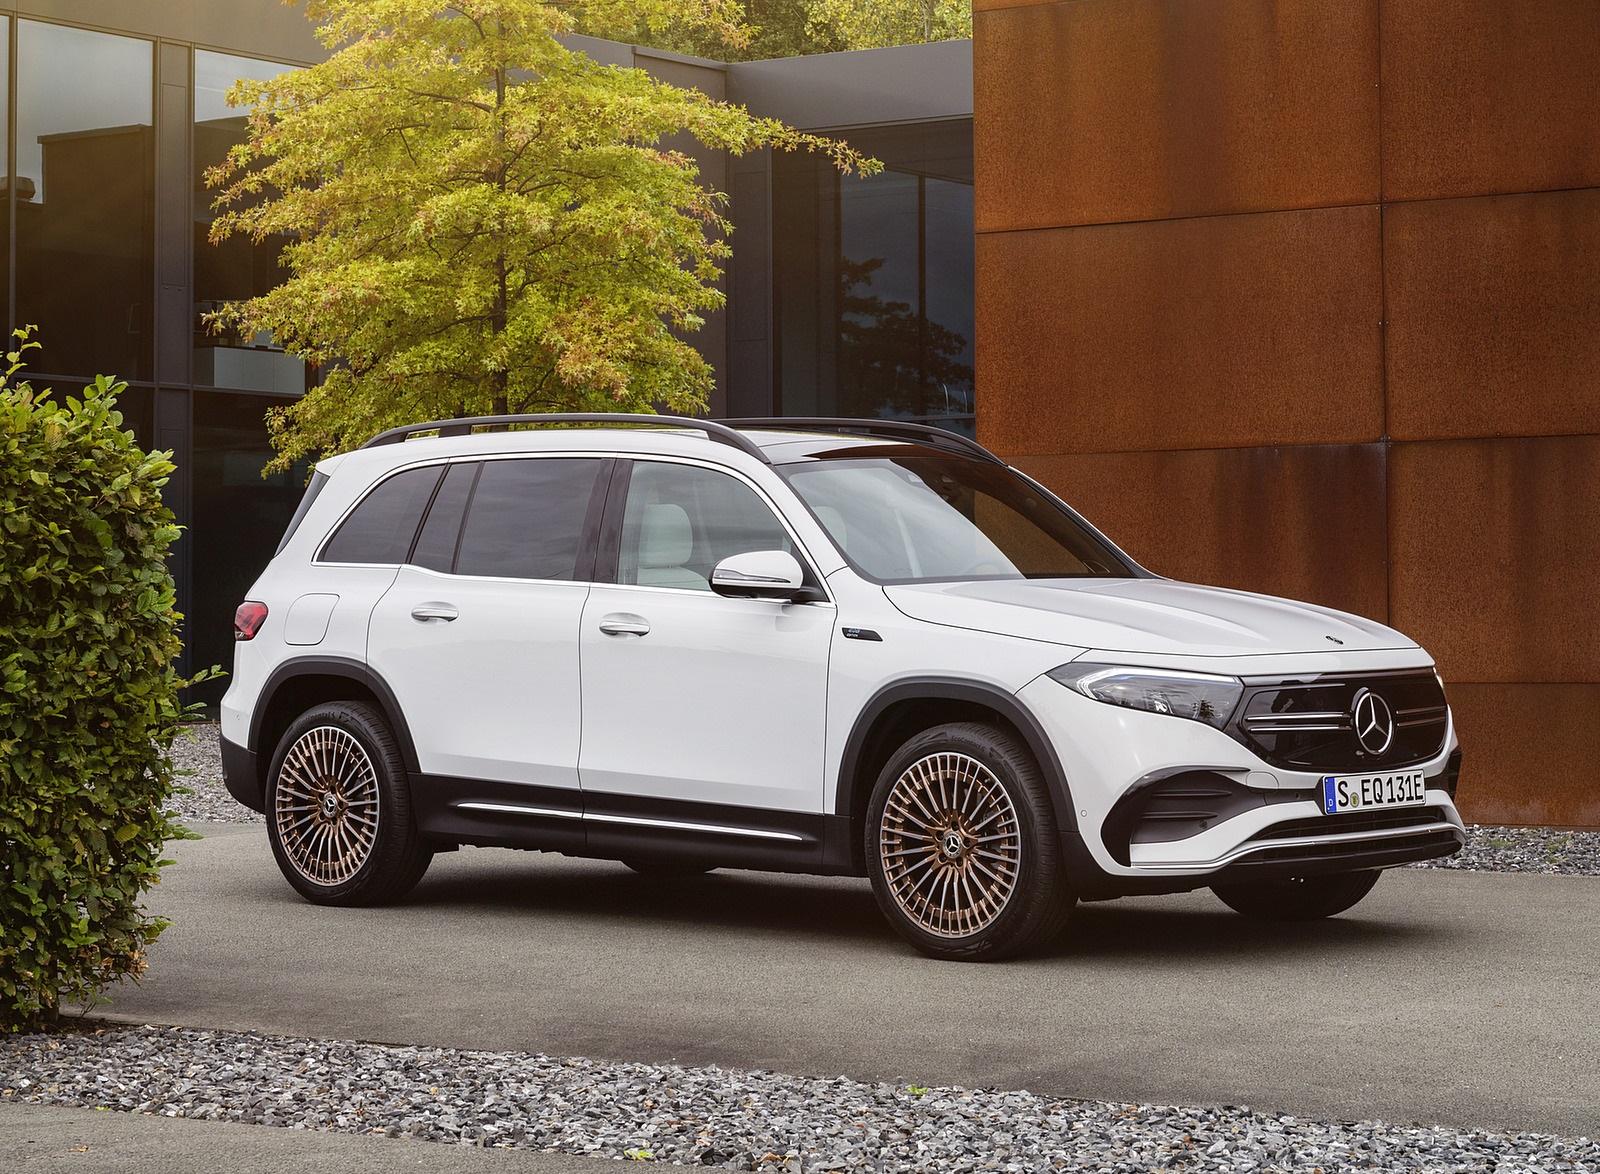 2022 Mercedes-Benz EQB Edition 1 (Color: Digital White) Front Three-Quarter Wallpapers (10)